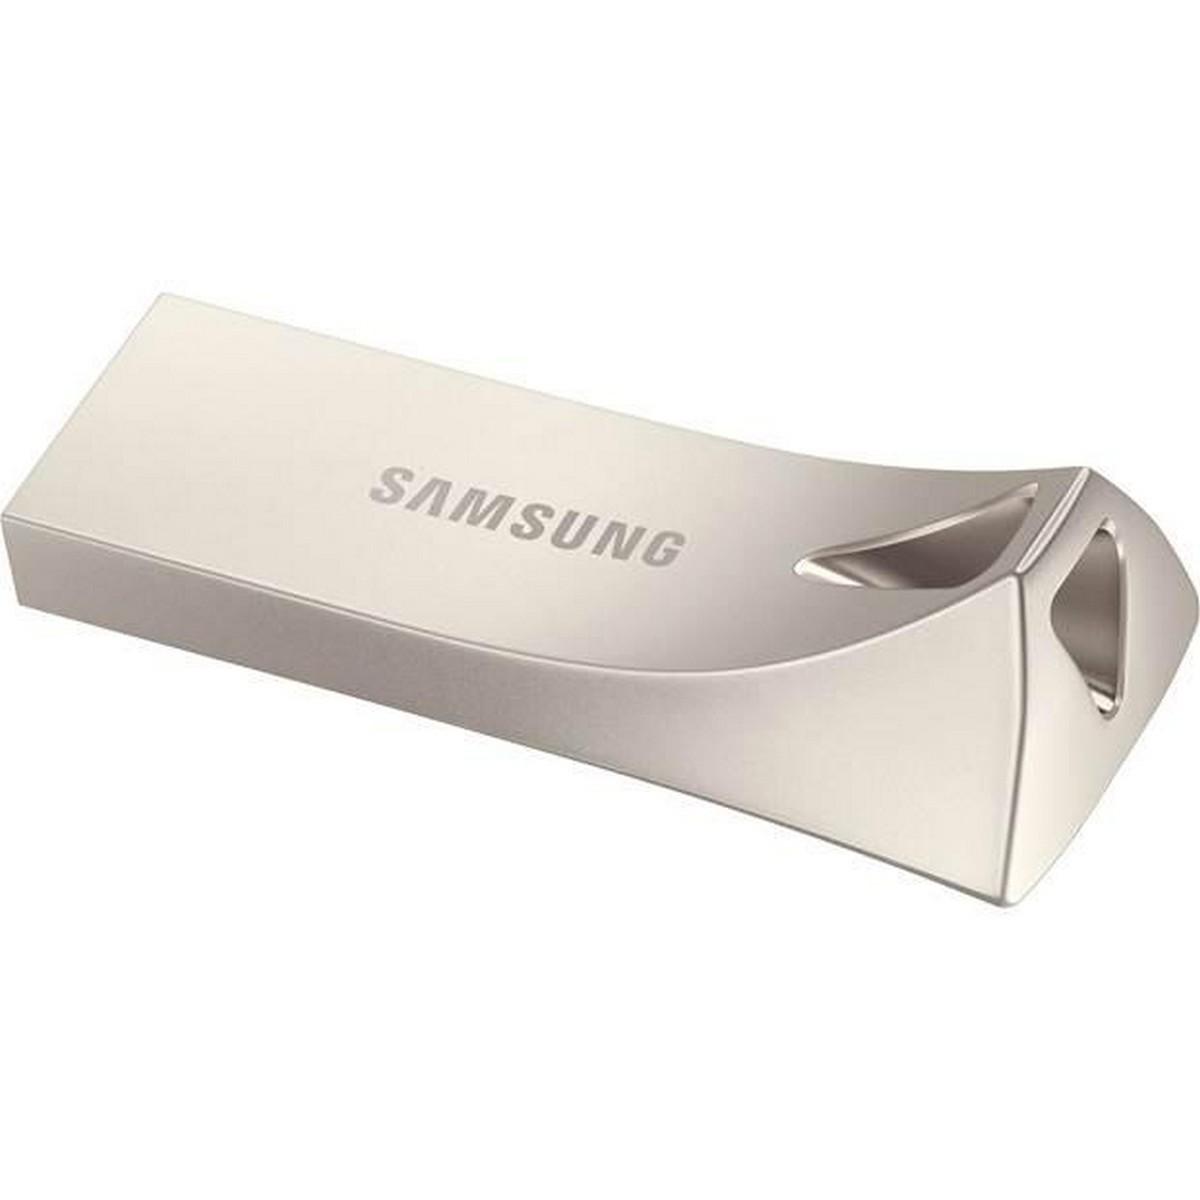 32GB Samsung USB 3.1 Flash Drive BAR Plus Champagne Silver